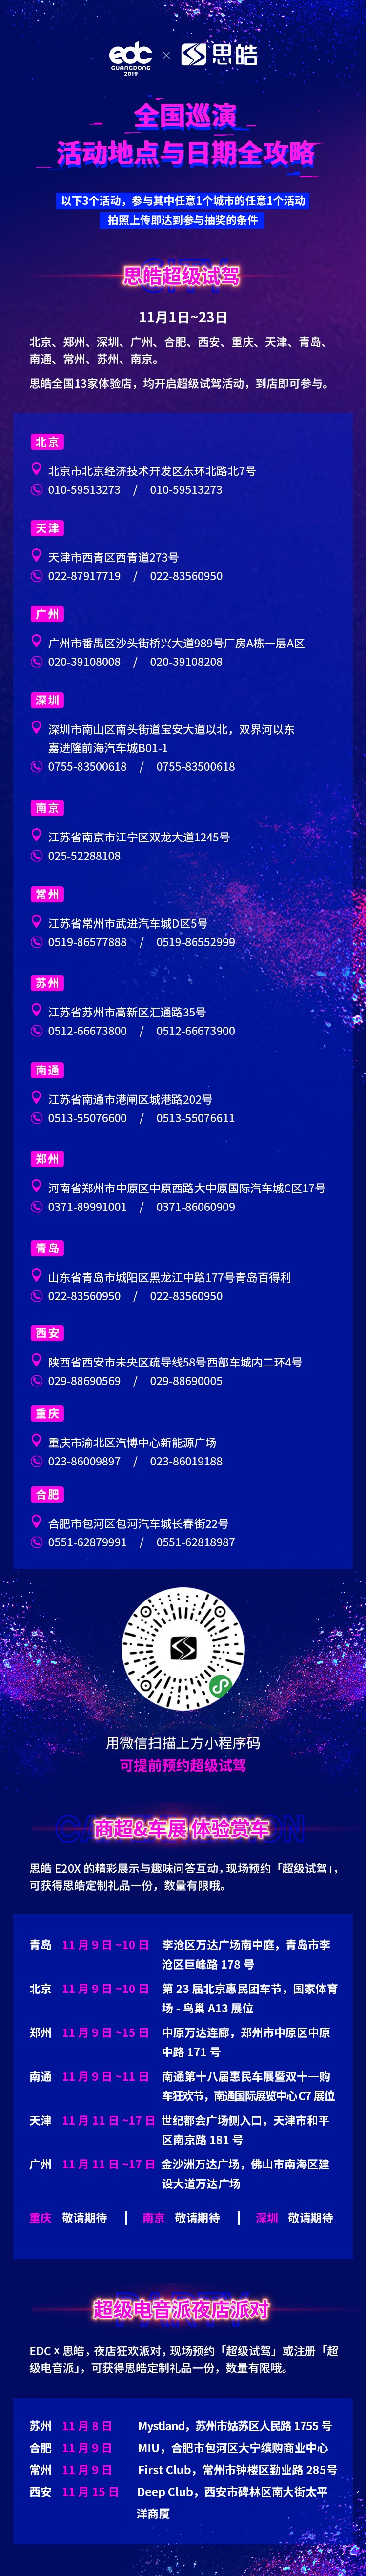 """2019 EDC x 思皓心声不凡超级电音派""全国巡演魅力来袭"